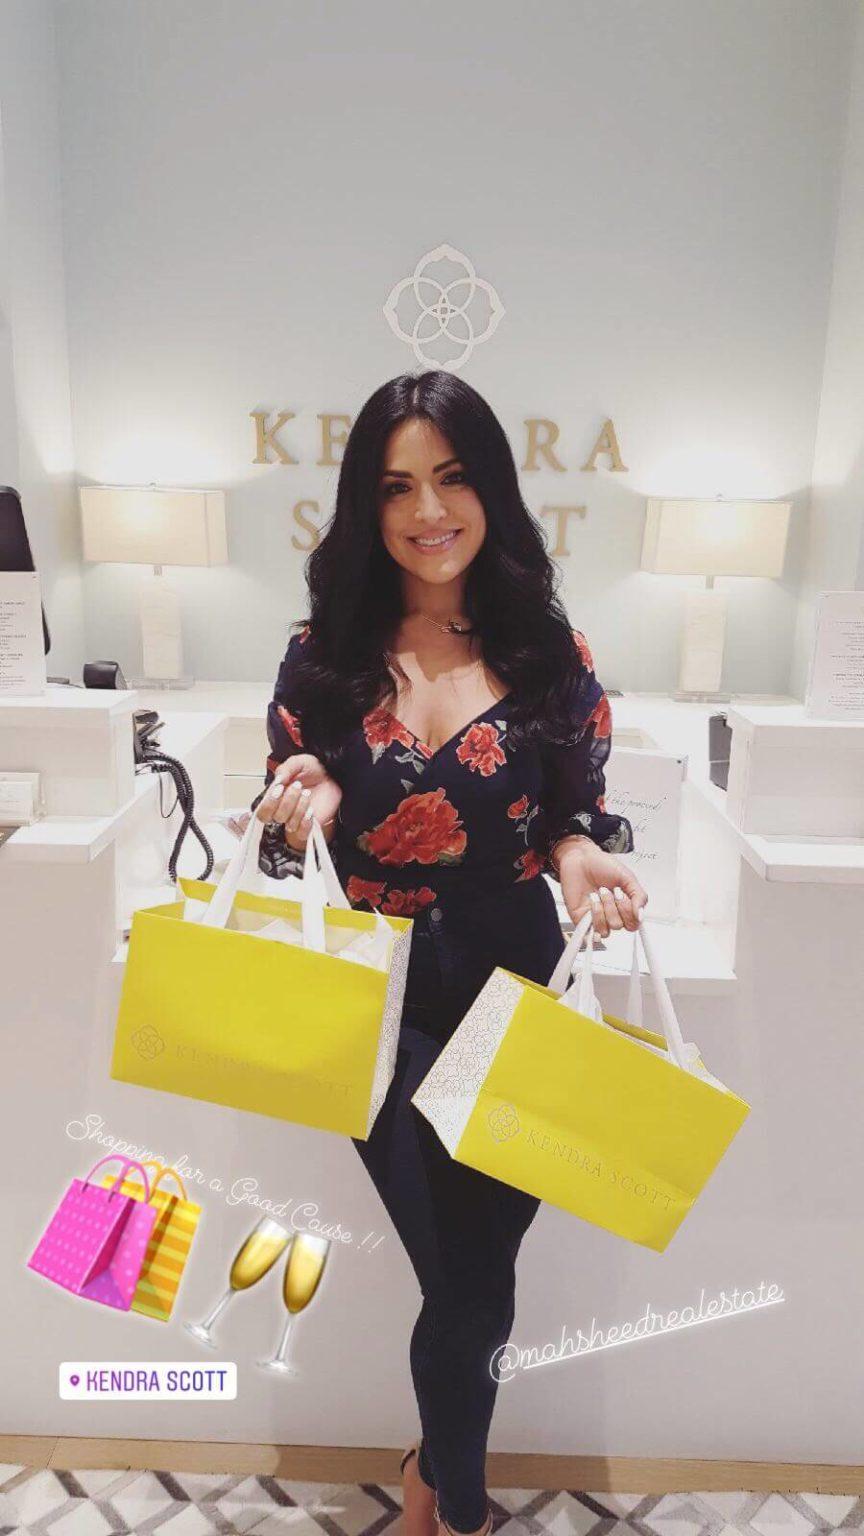 Mahsheed's Instagram story at Kendra Scott